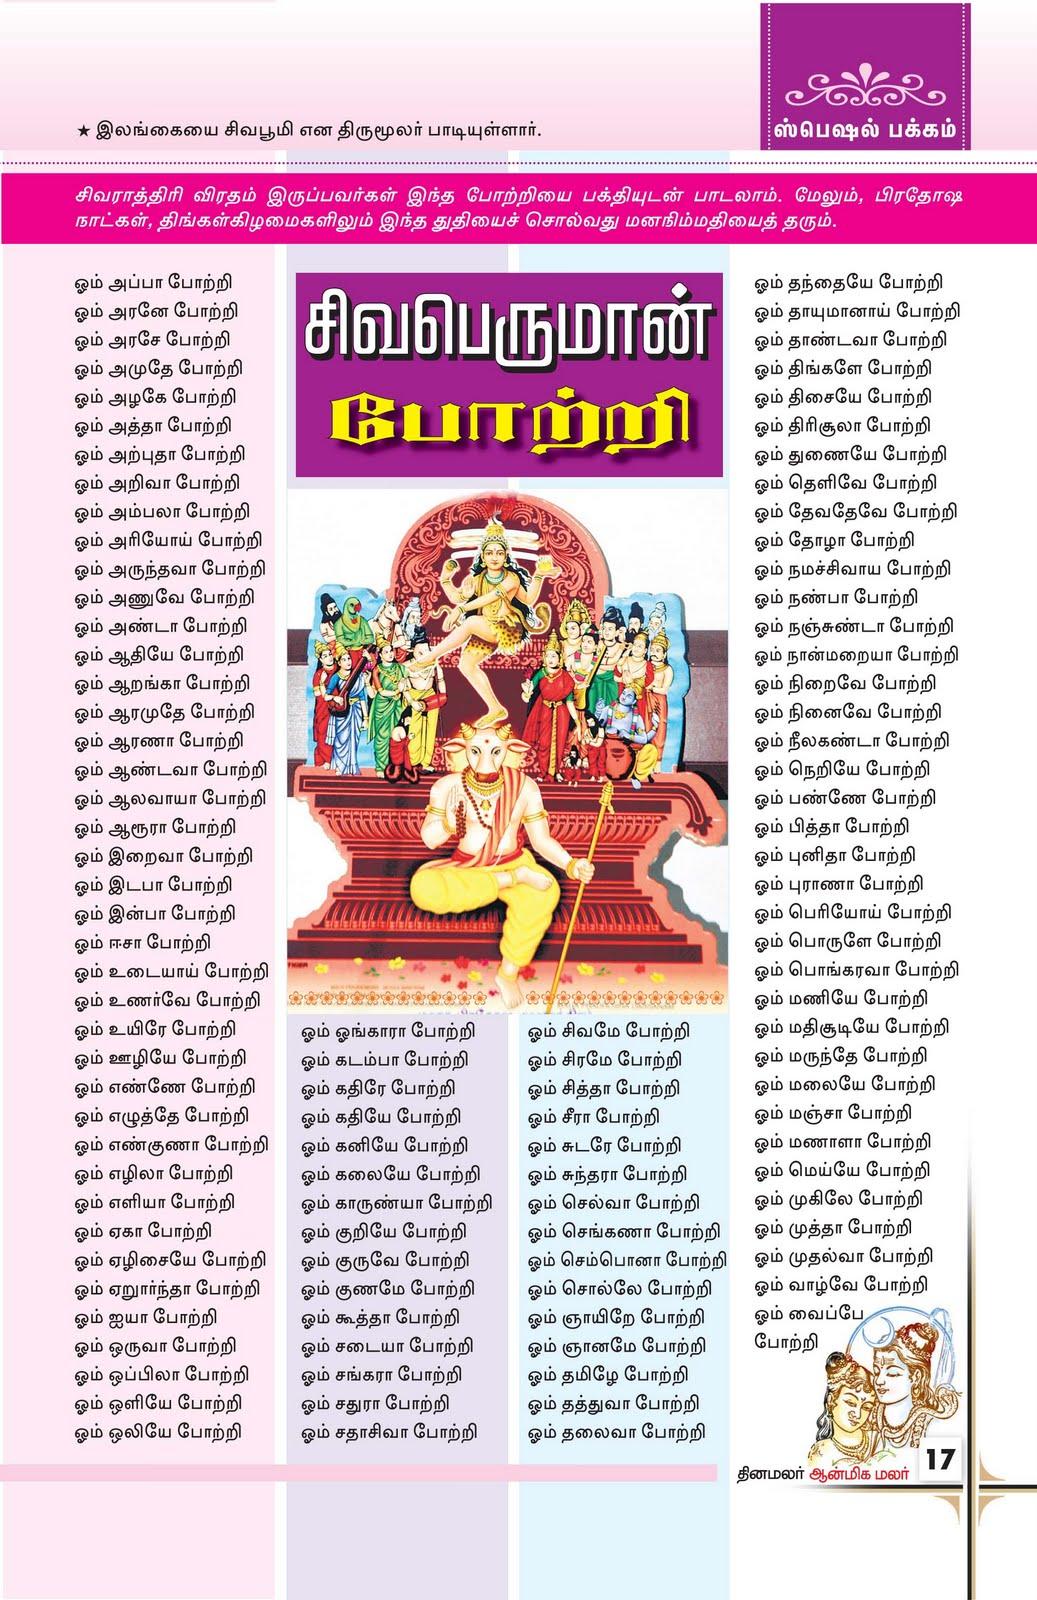 1008 sivan pottri lyrics in tamil